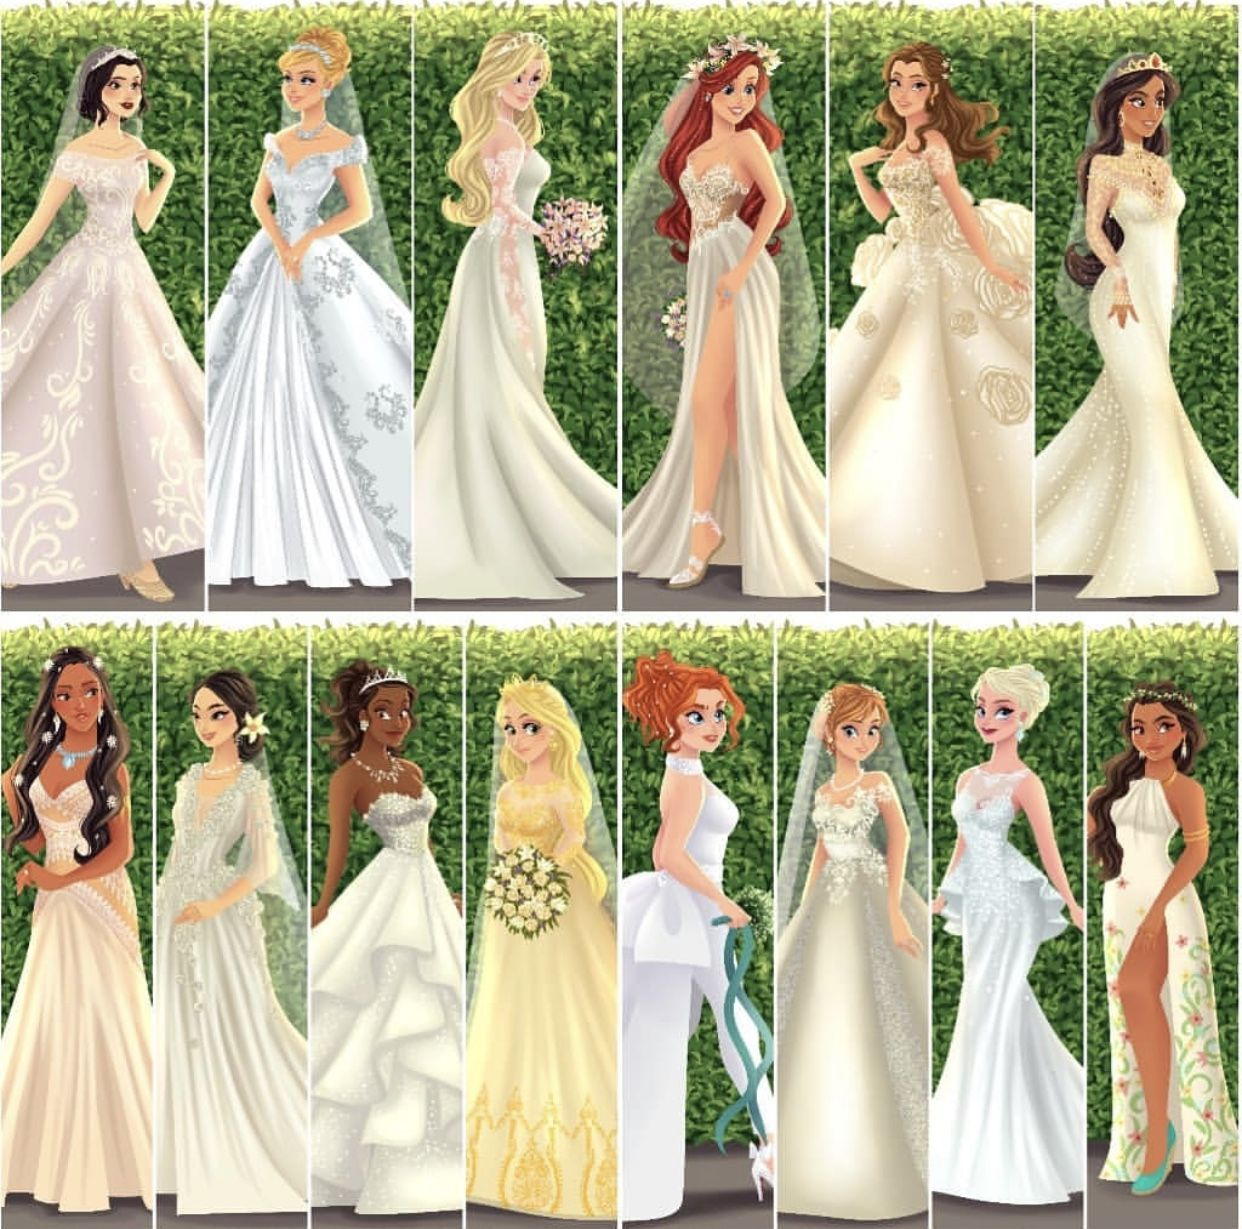 Princesses In Fashionable Wedding Dresses Disney Princess Wedding Disney Princess Wedding Dresses Disney Princess Dresses